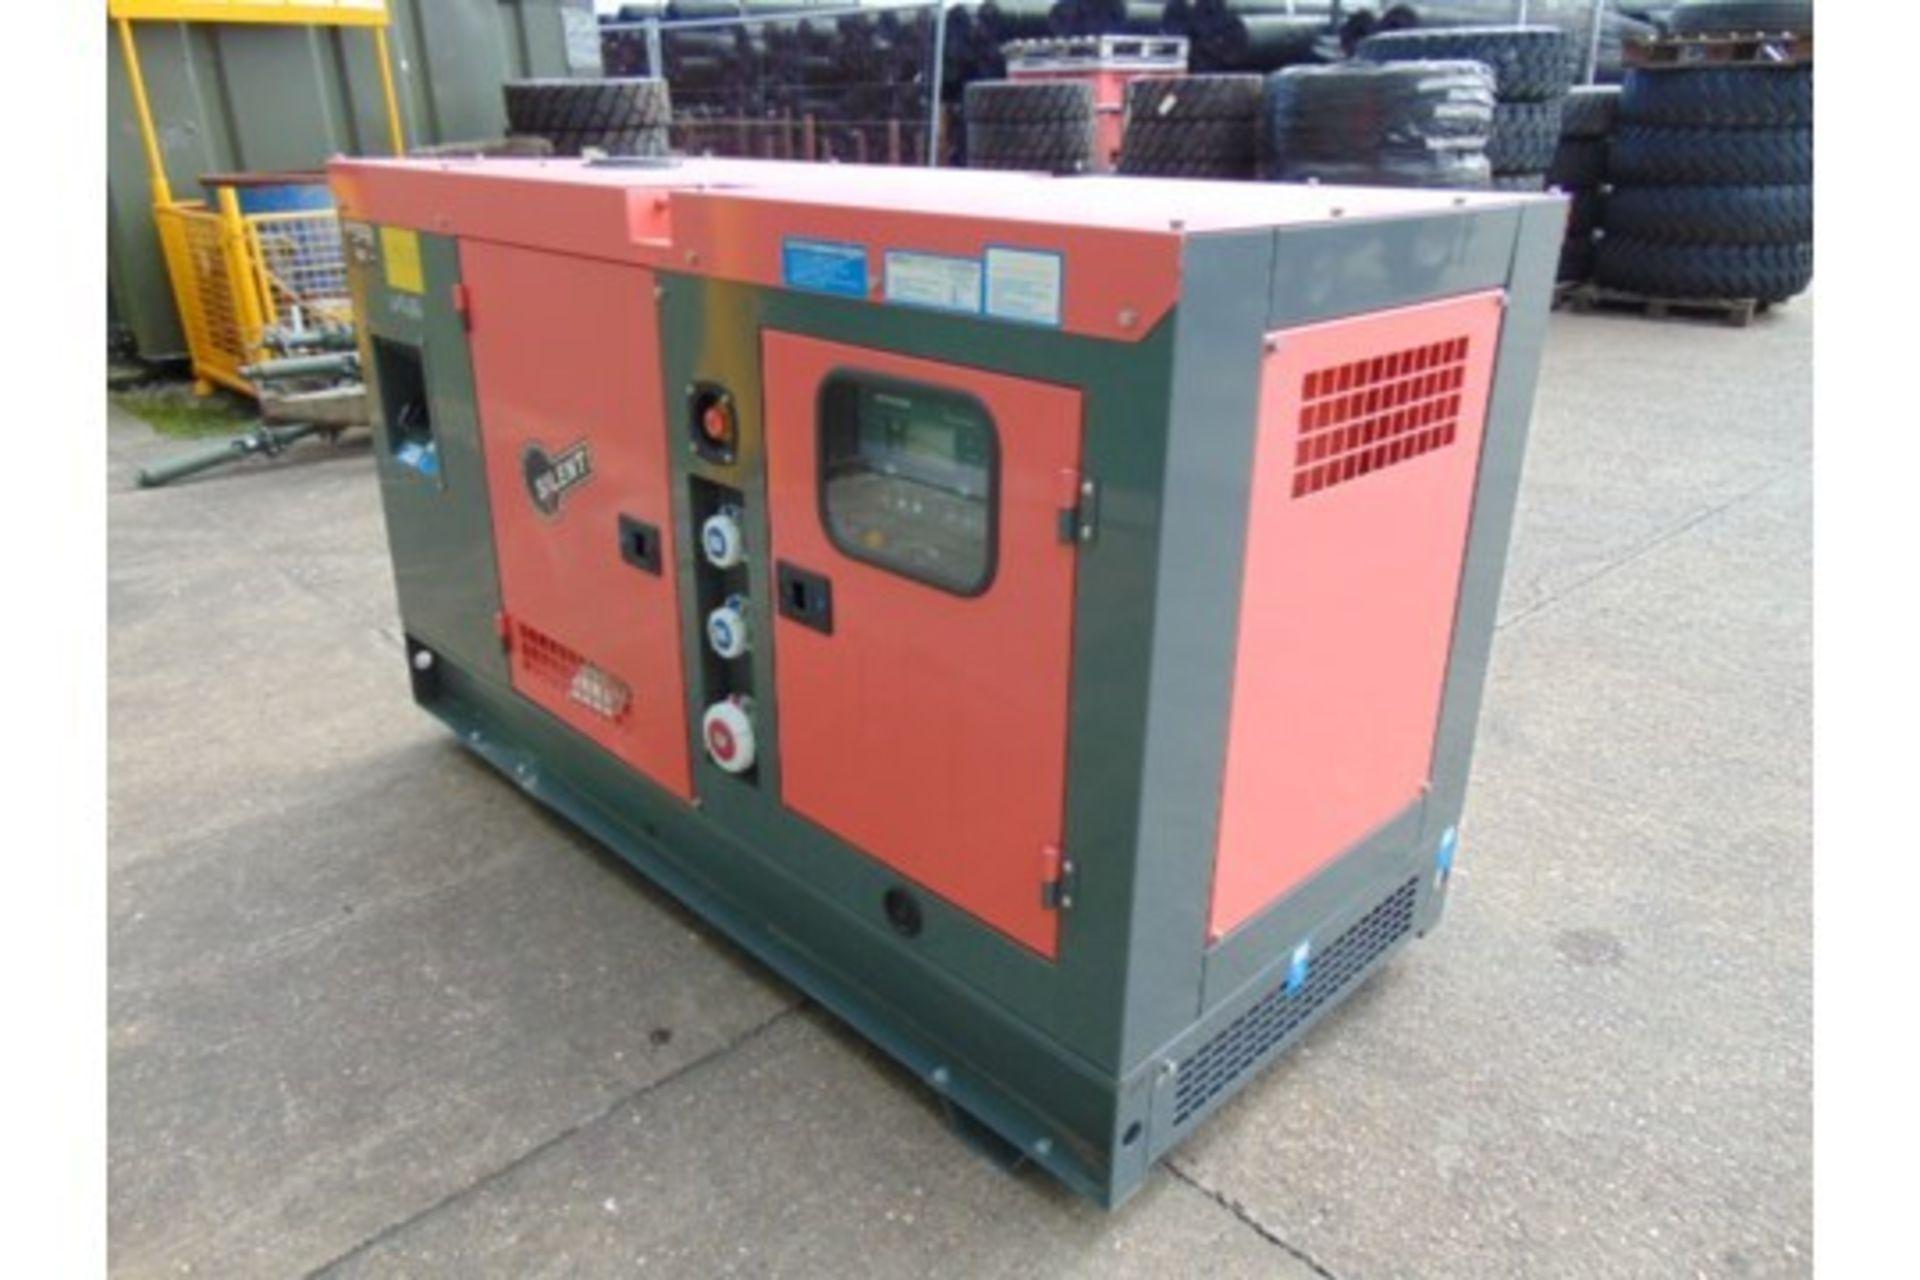 Lot 27328 - UNISSUED 50 KVA 3 Phase Silent Diesel Generator Set